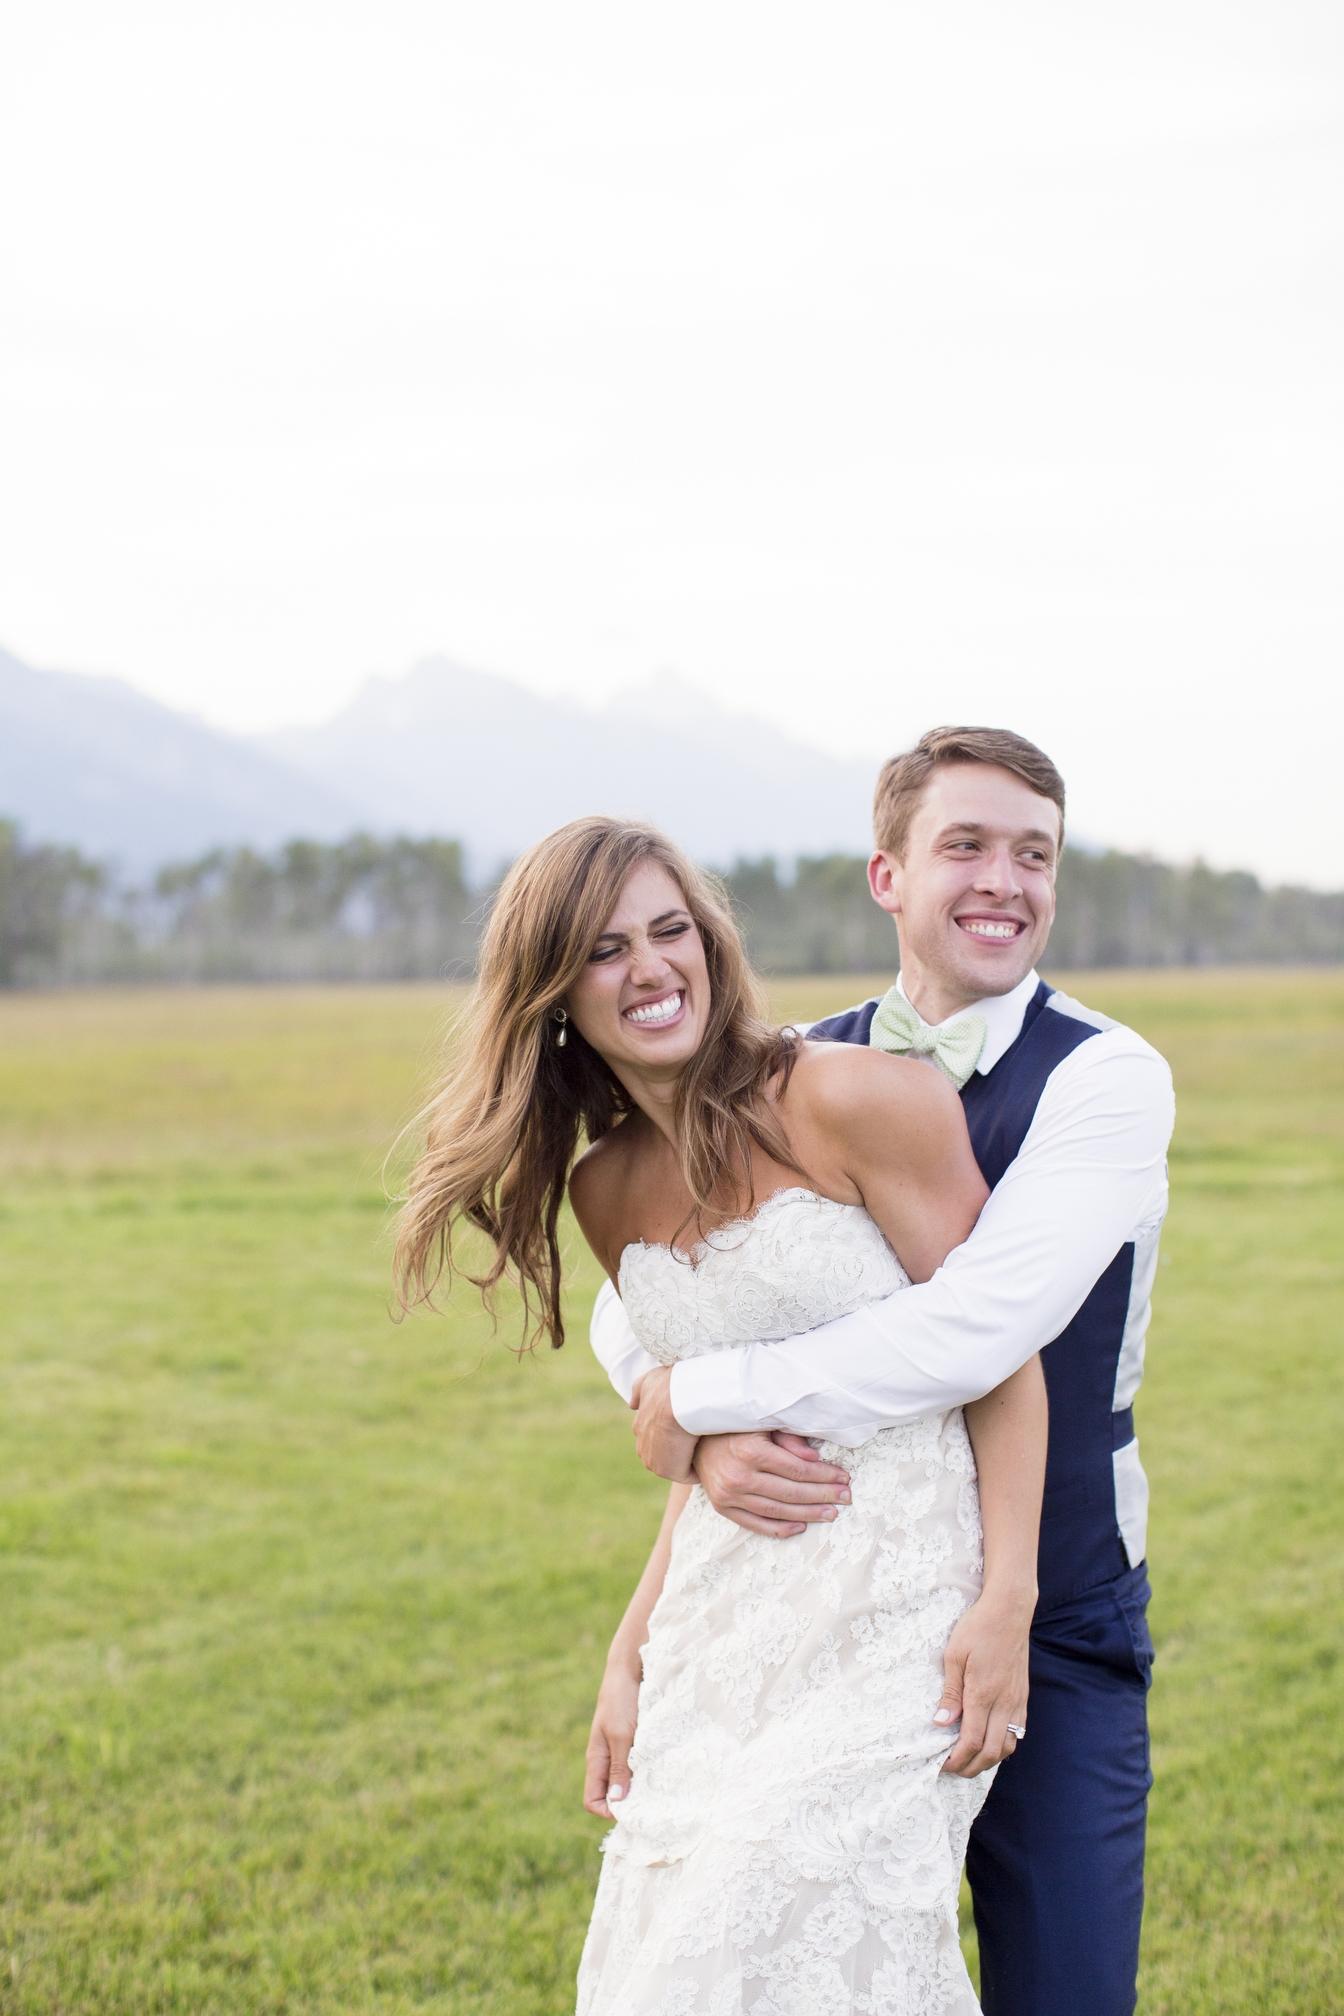 DeLarosa Wedding Jackson Hole 2104m_0409.JPG